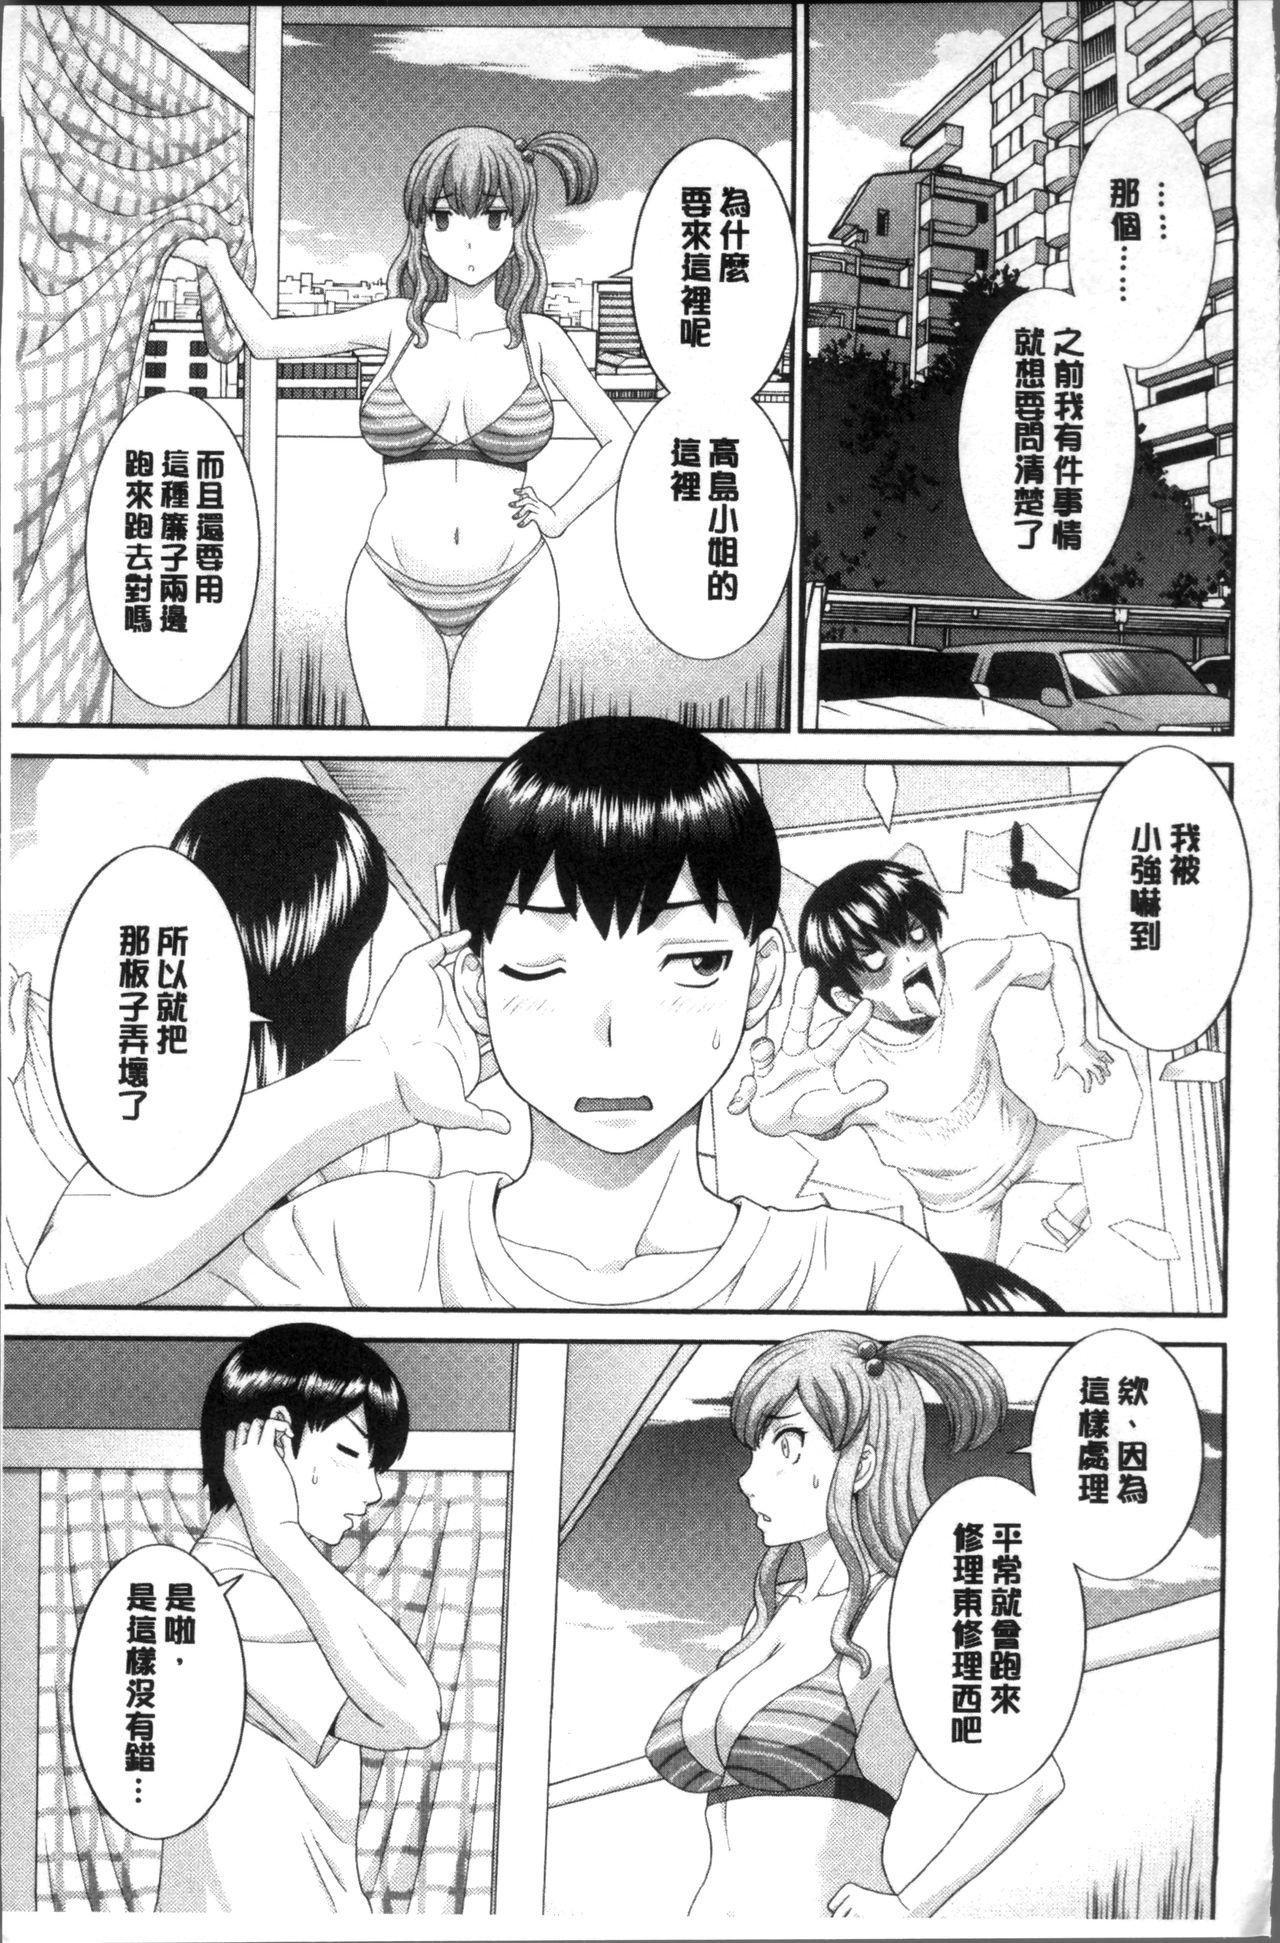 [Kawamori Misaki] Innyuu Shufu no Futei Ganbou - Oku-san to Kanojo to 2 | 淫乳主婦的不貞願望 和人妻也和女友❤2 [Chinese] 8